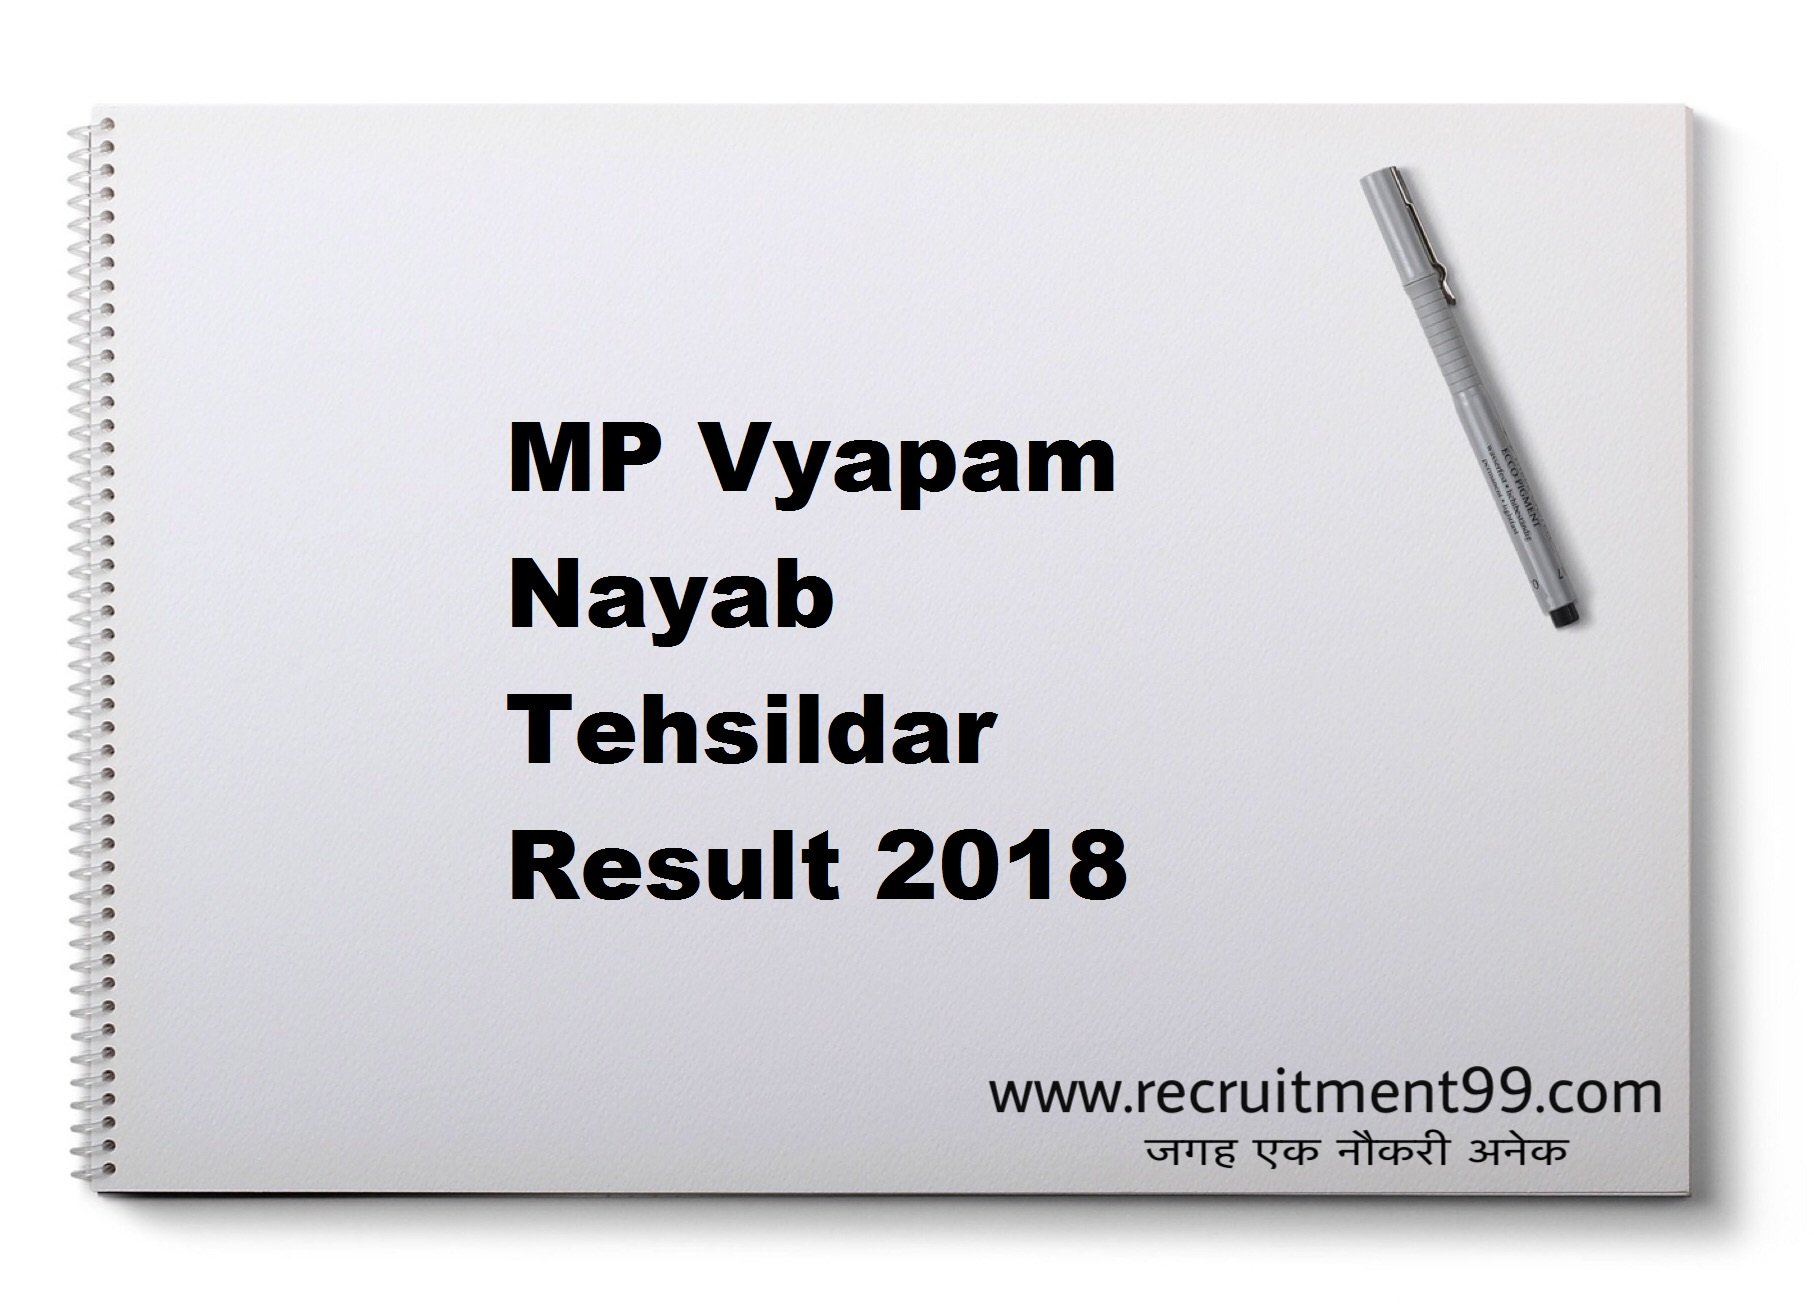 MP Vyapam Nayab Tehsildar Result 2018